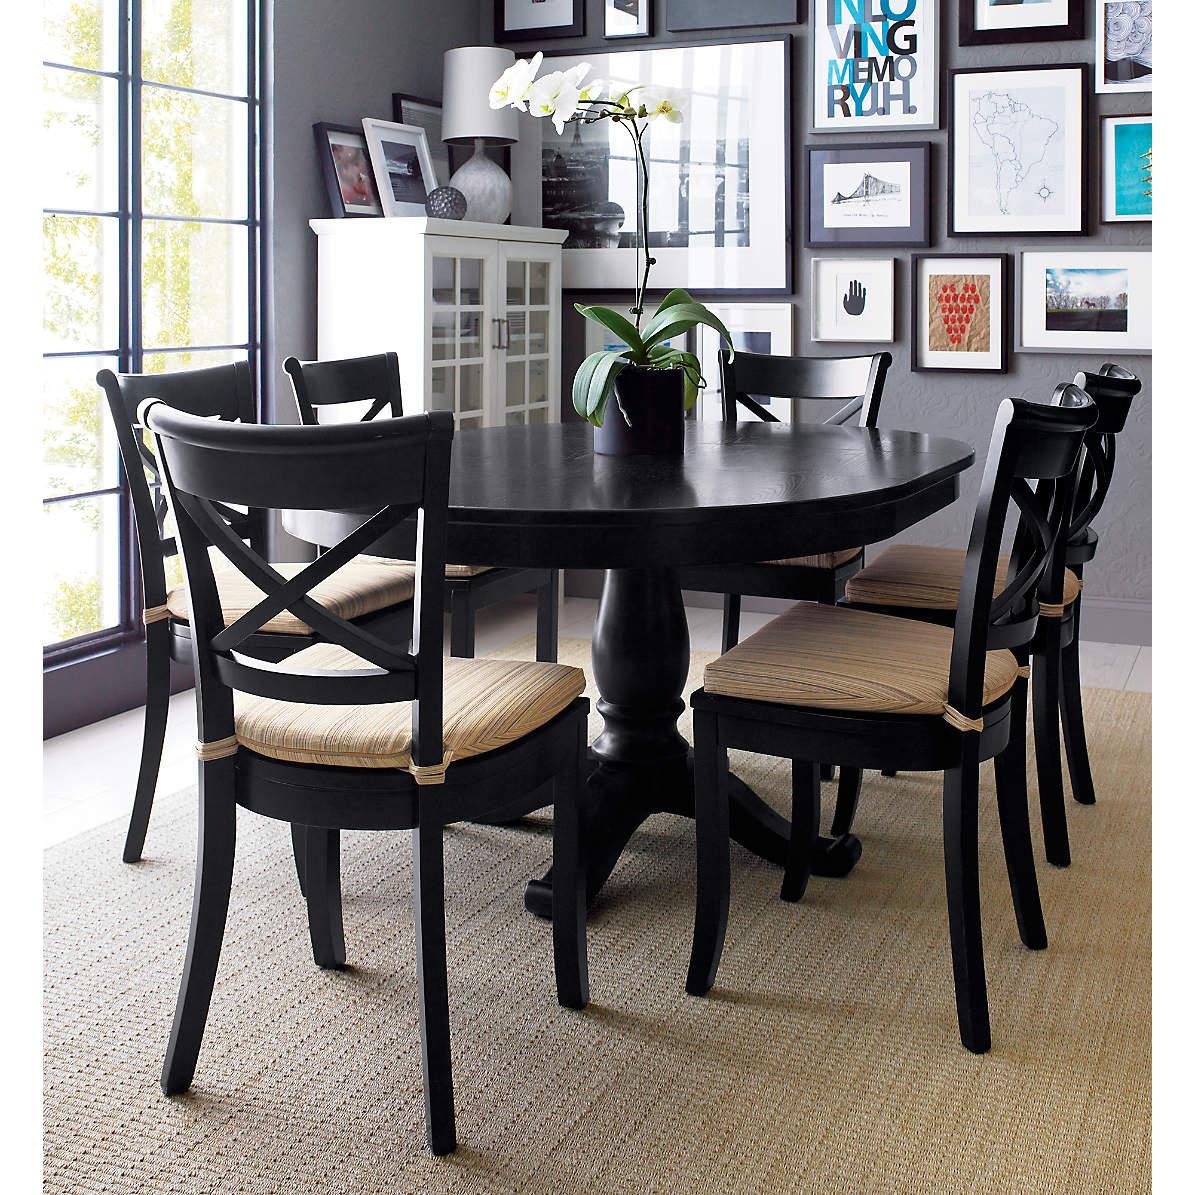 Avalon 45 Black Round Extension Dining, Black Dining Room Table